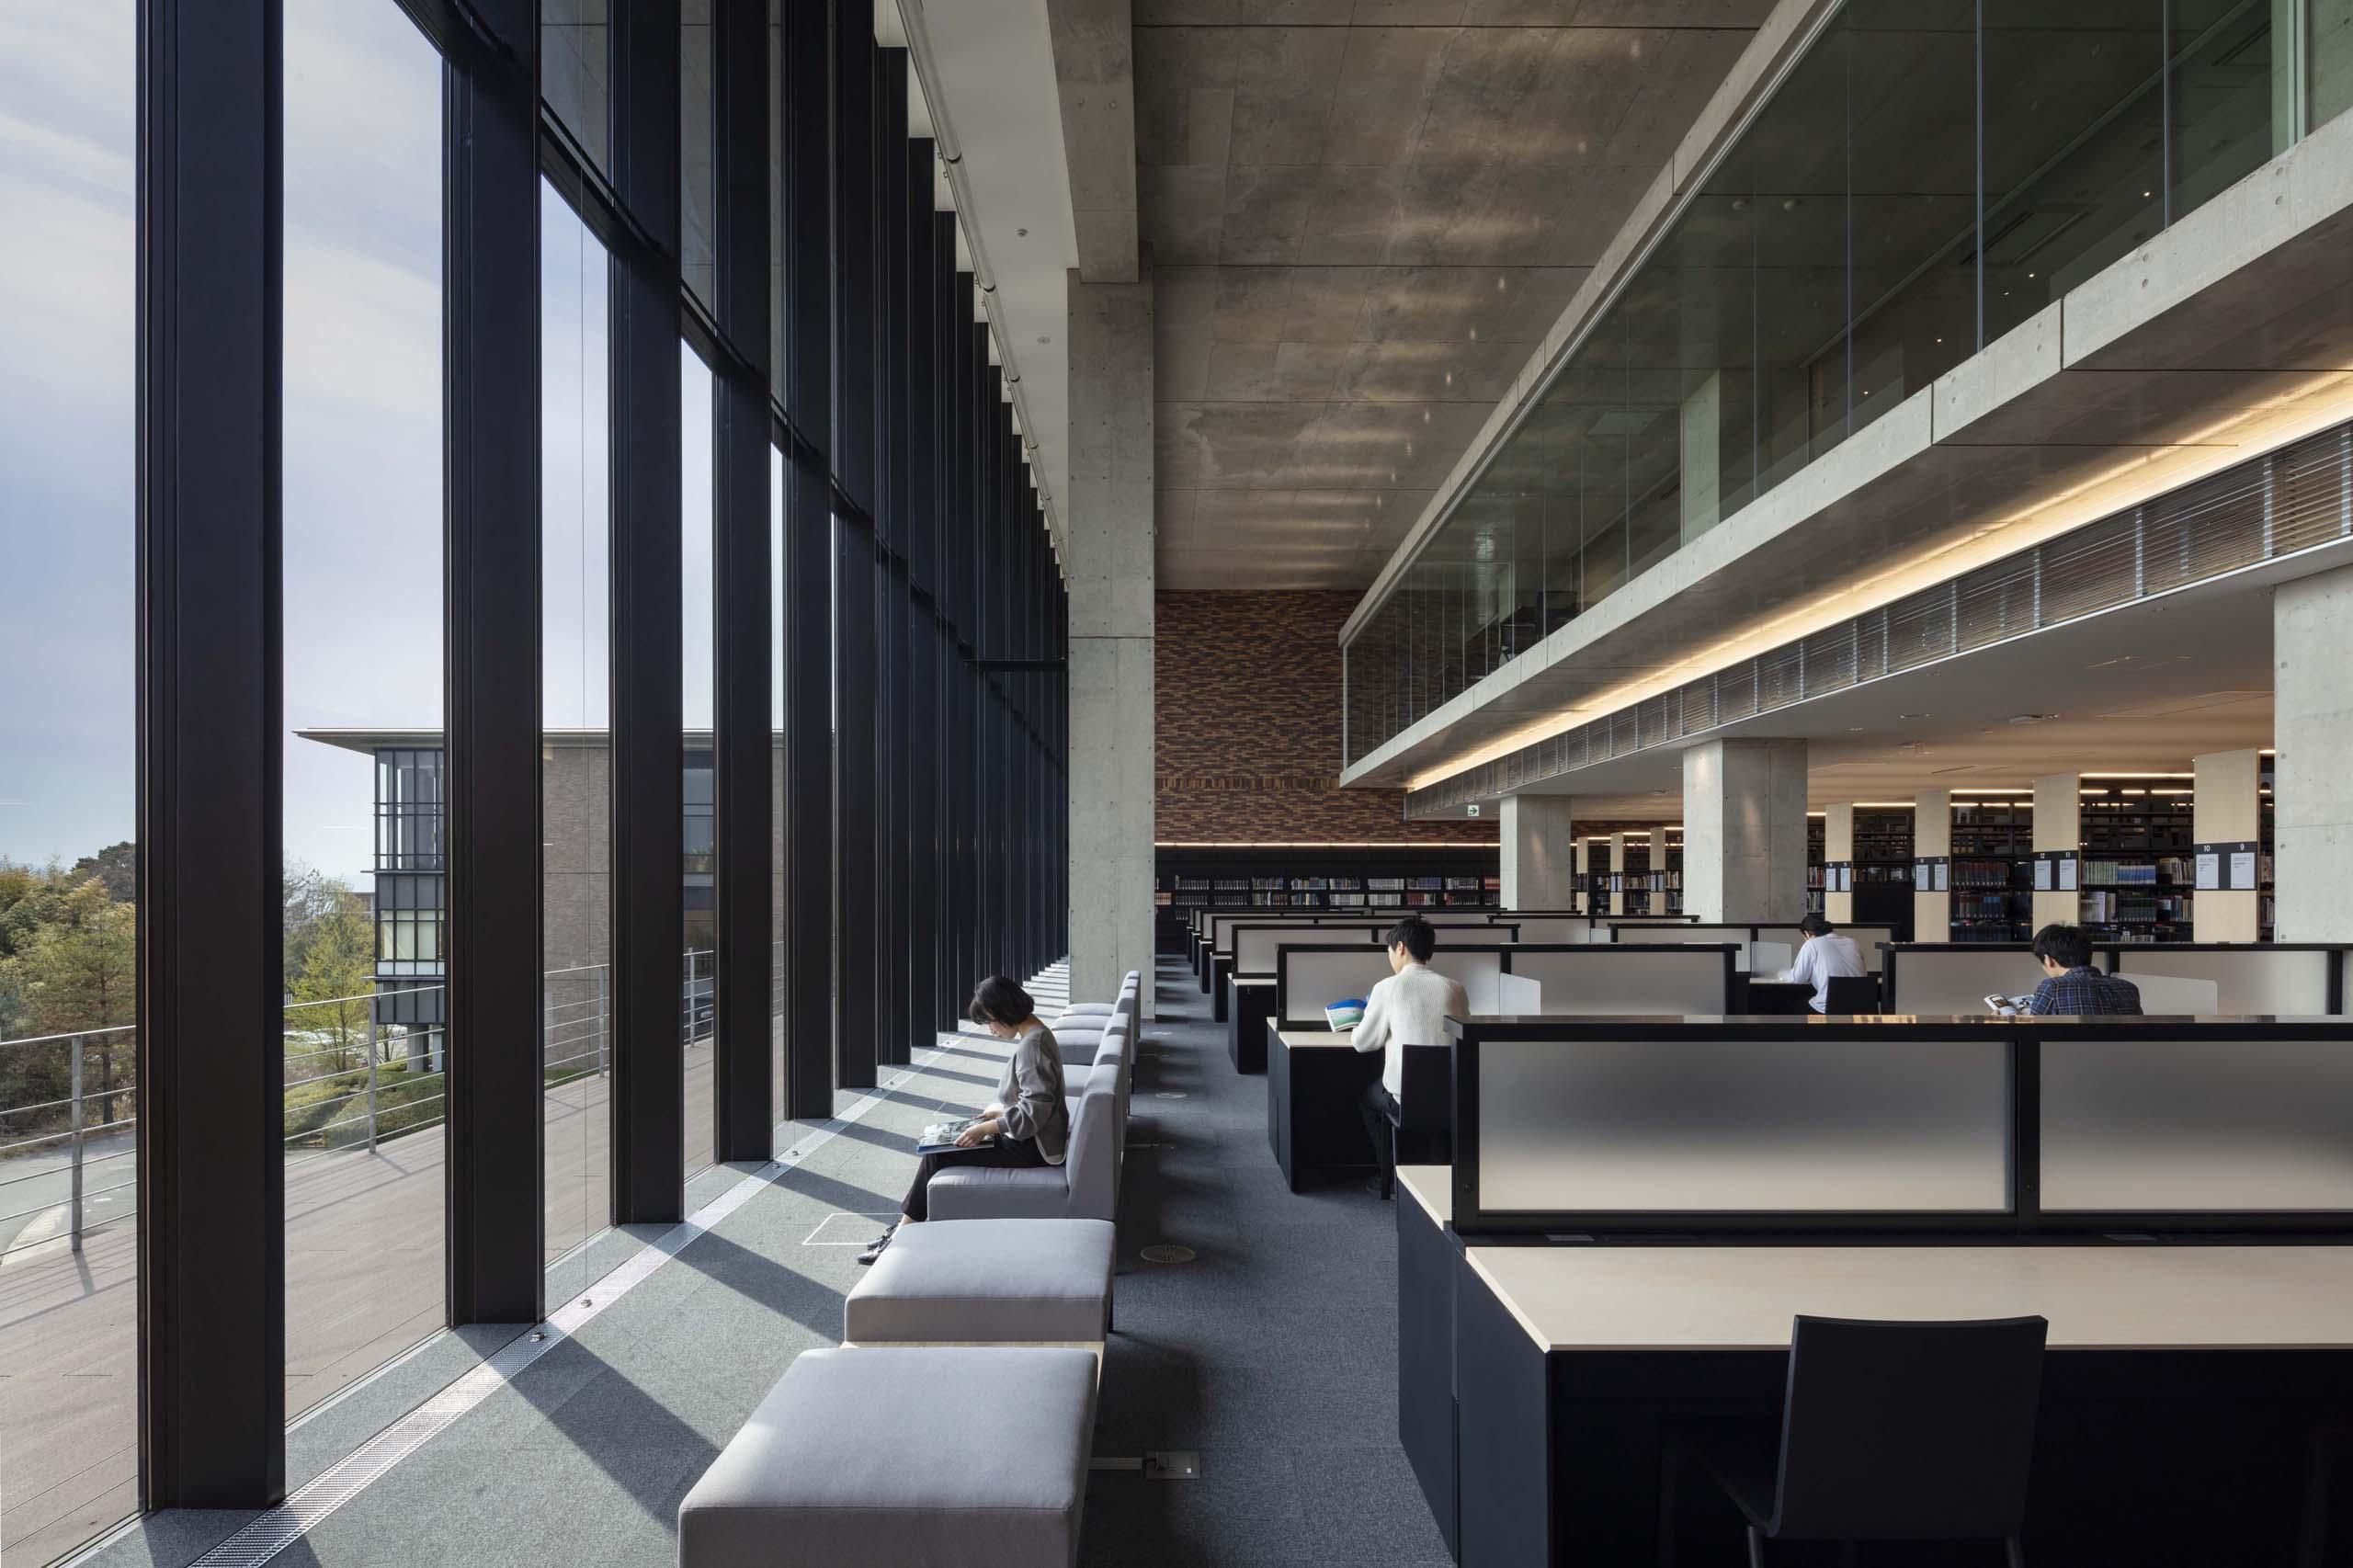 Katsura Library, Kyoto University | WORKS |